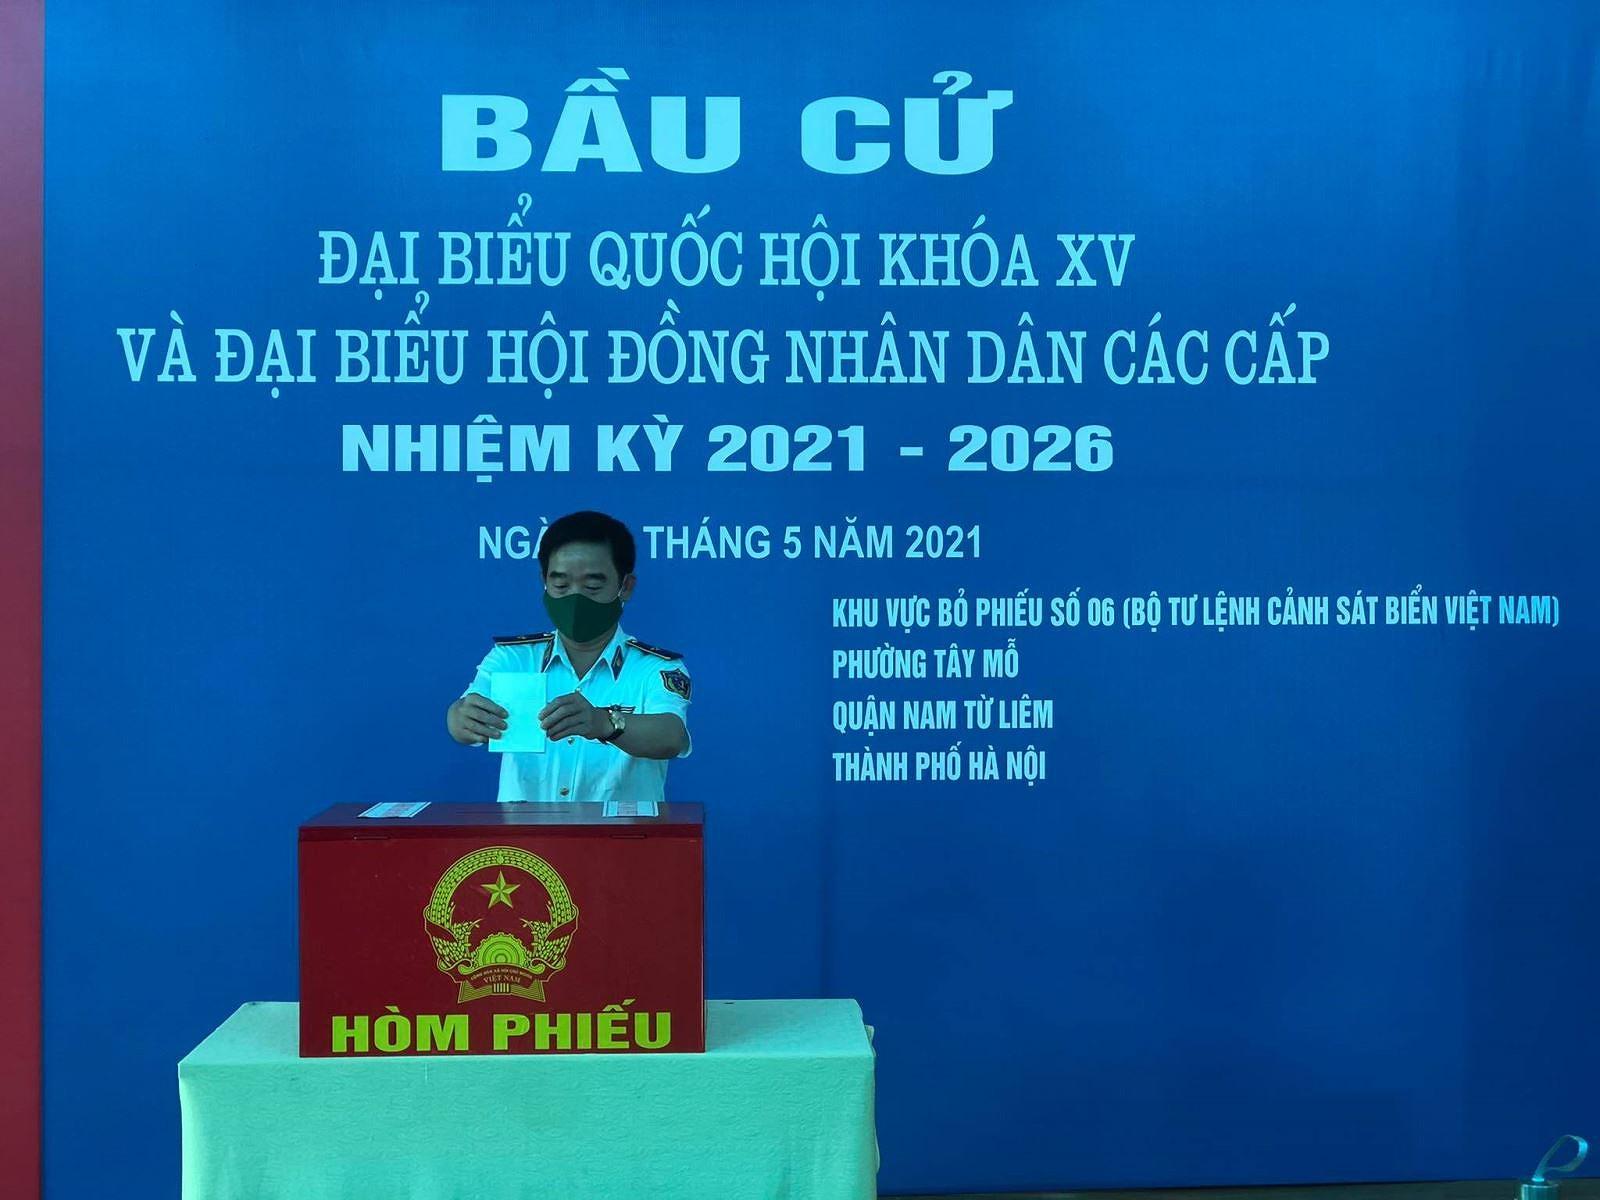 Tren 500 cu tri tai Bo Tu lenh Canh sat bien Viet Nam di bo phieu hinh anh 4